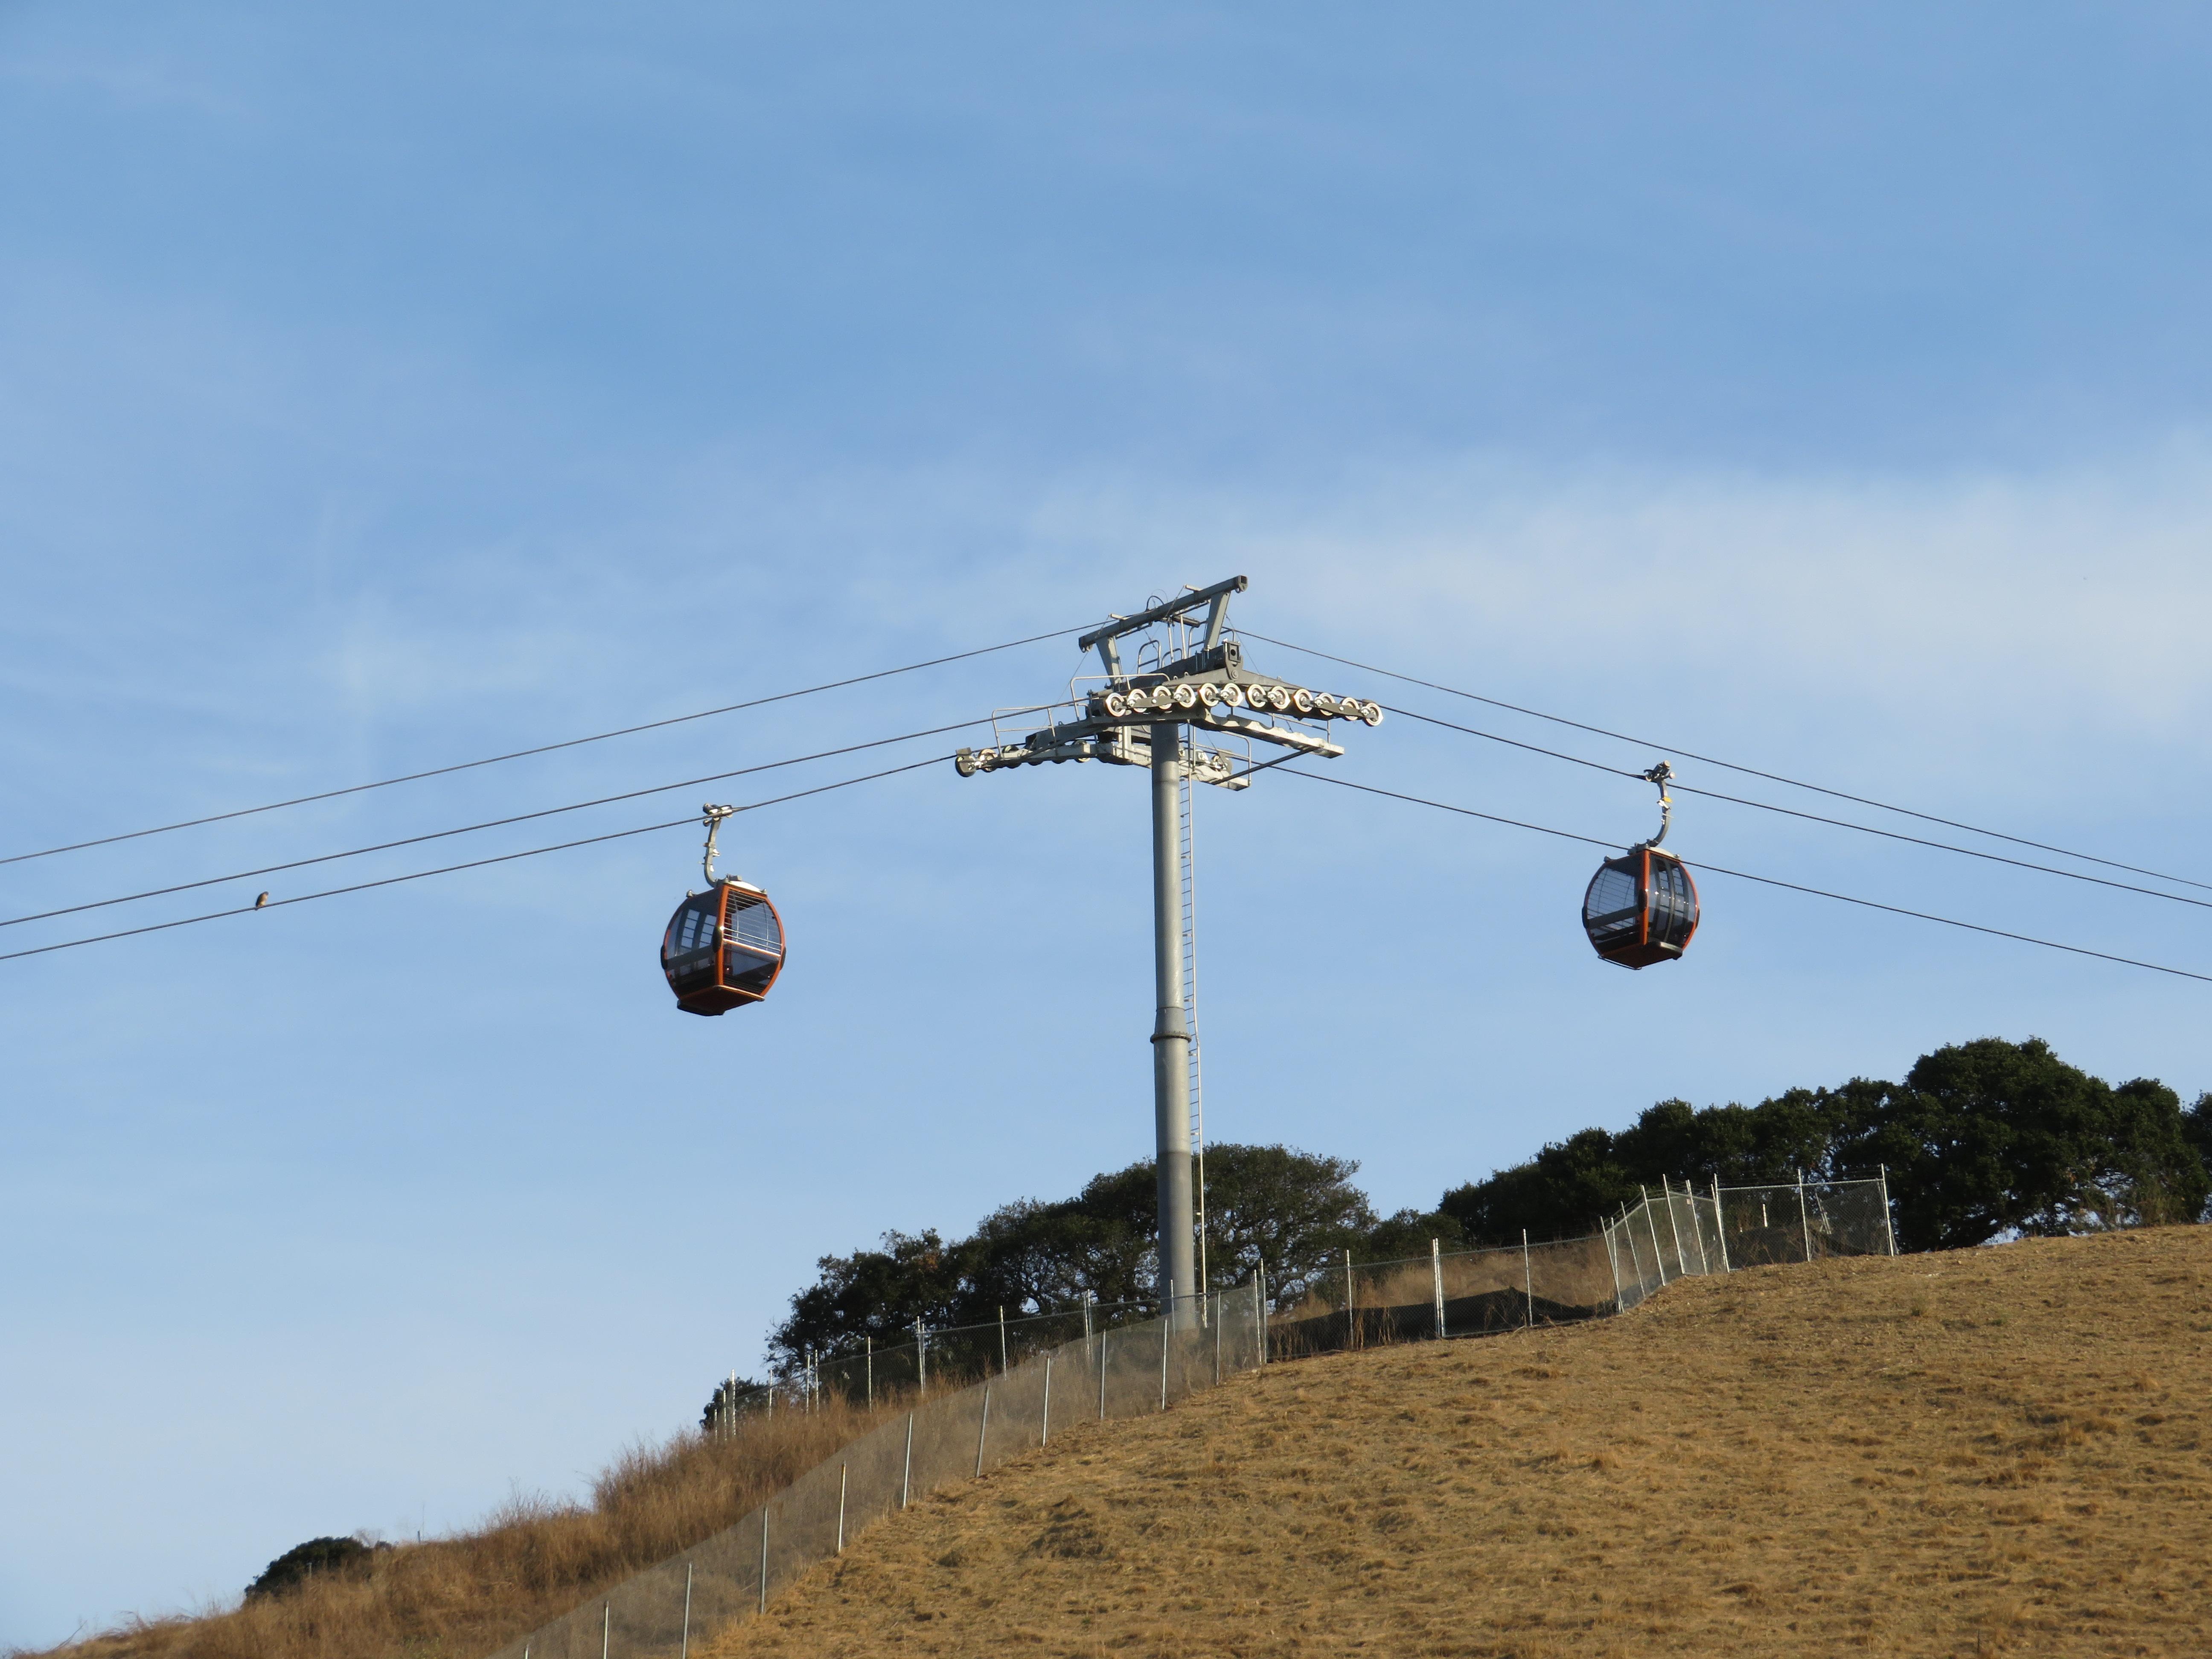 Californias great america lift blog img3391 kristyandbryce Image collections